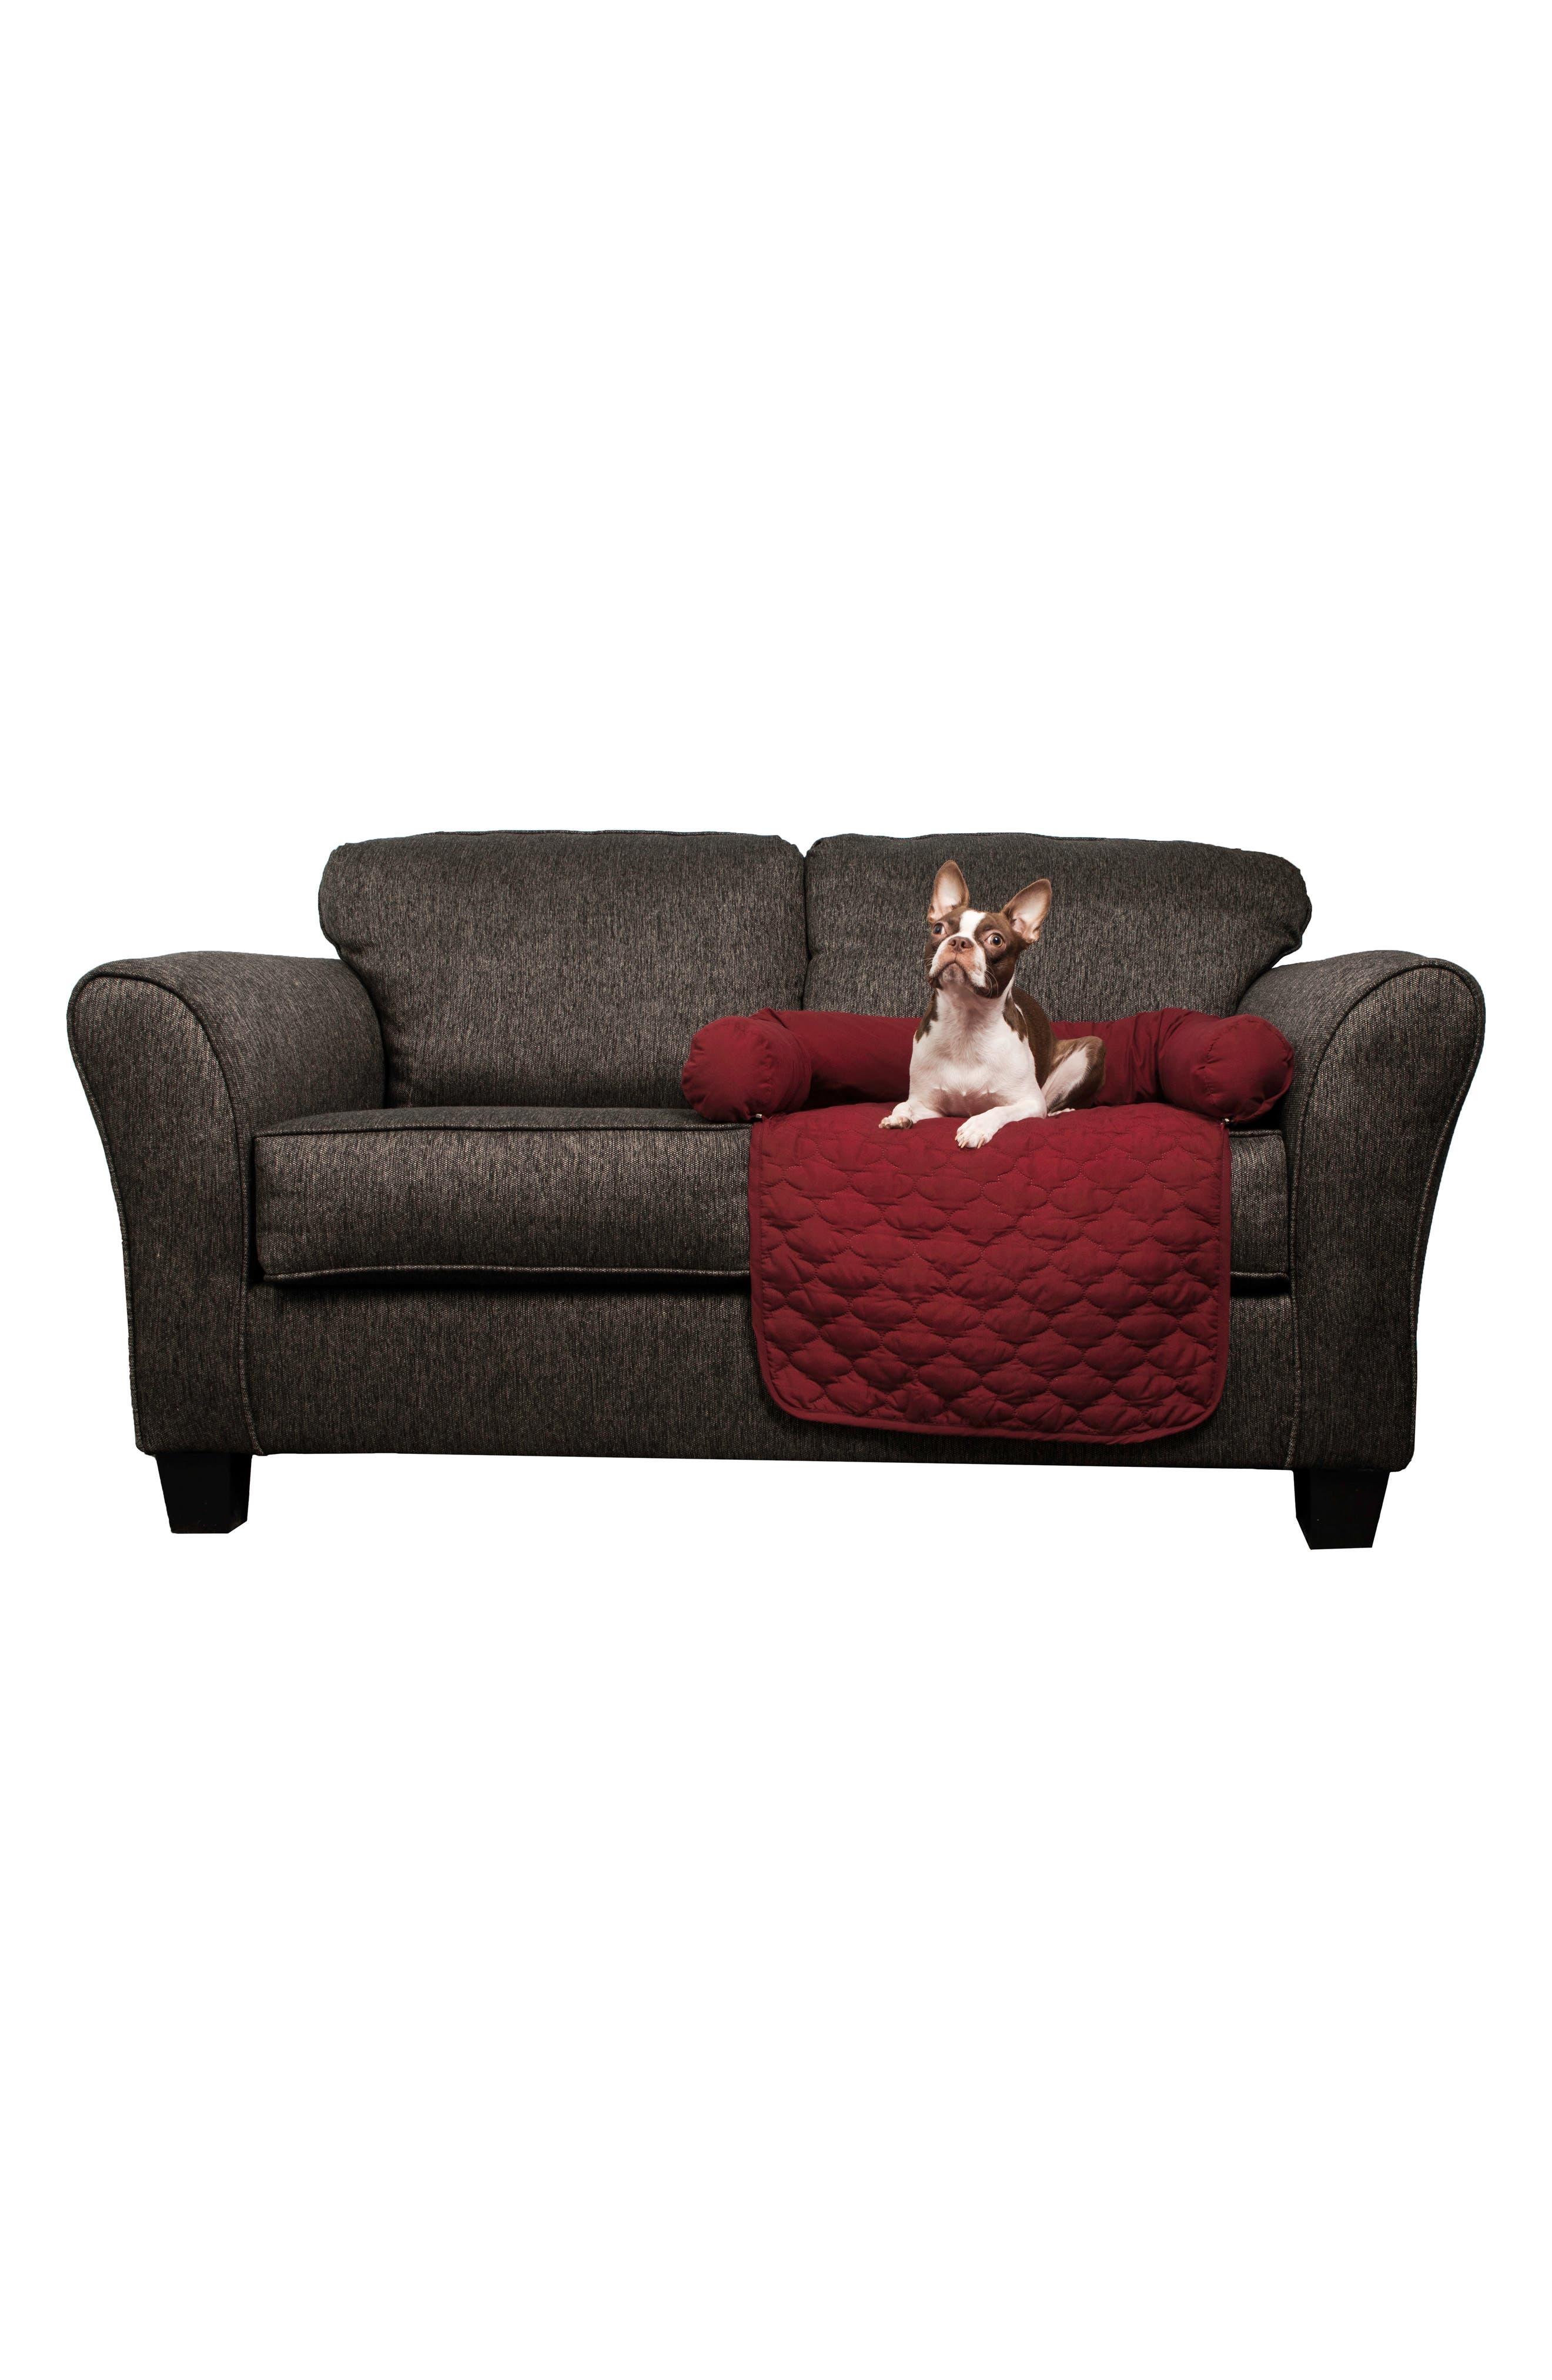 Duck River Textile Wubba Reversible Pet Bed Nordstrom : 100275841 from shop.nordstrom.com size 704 x 1080 jpeg 85kB